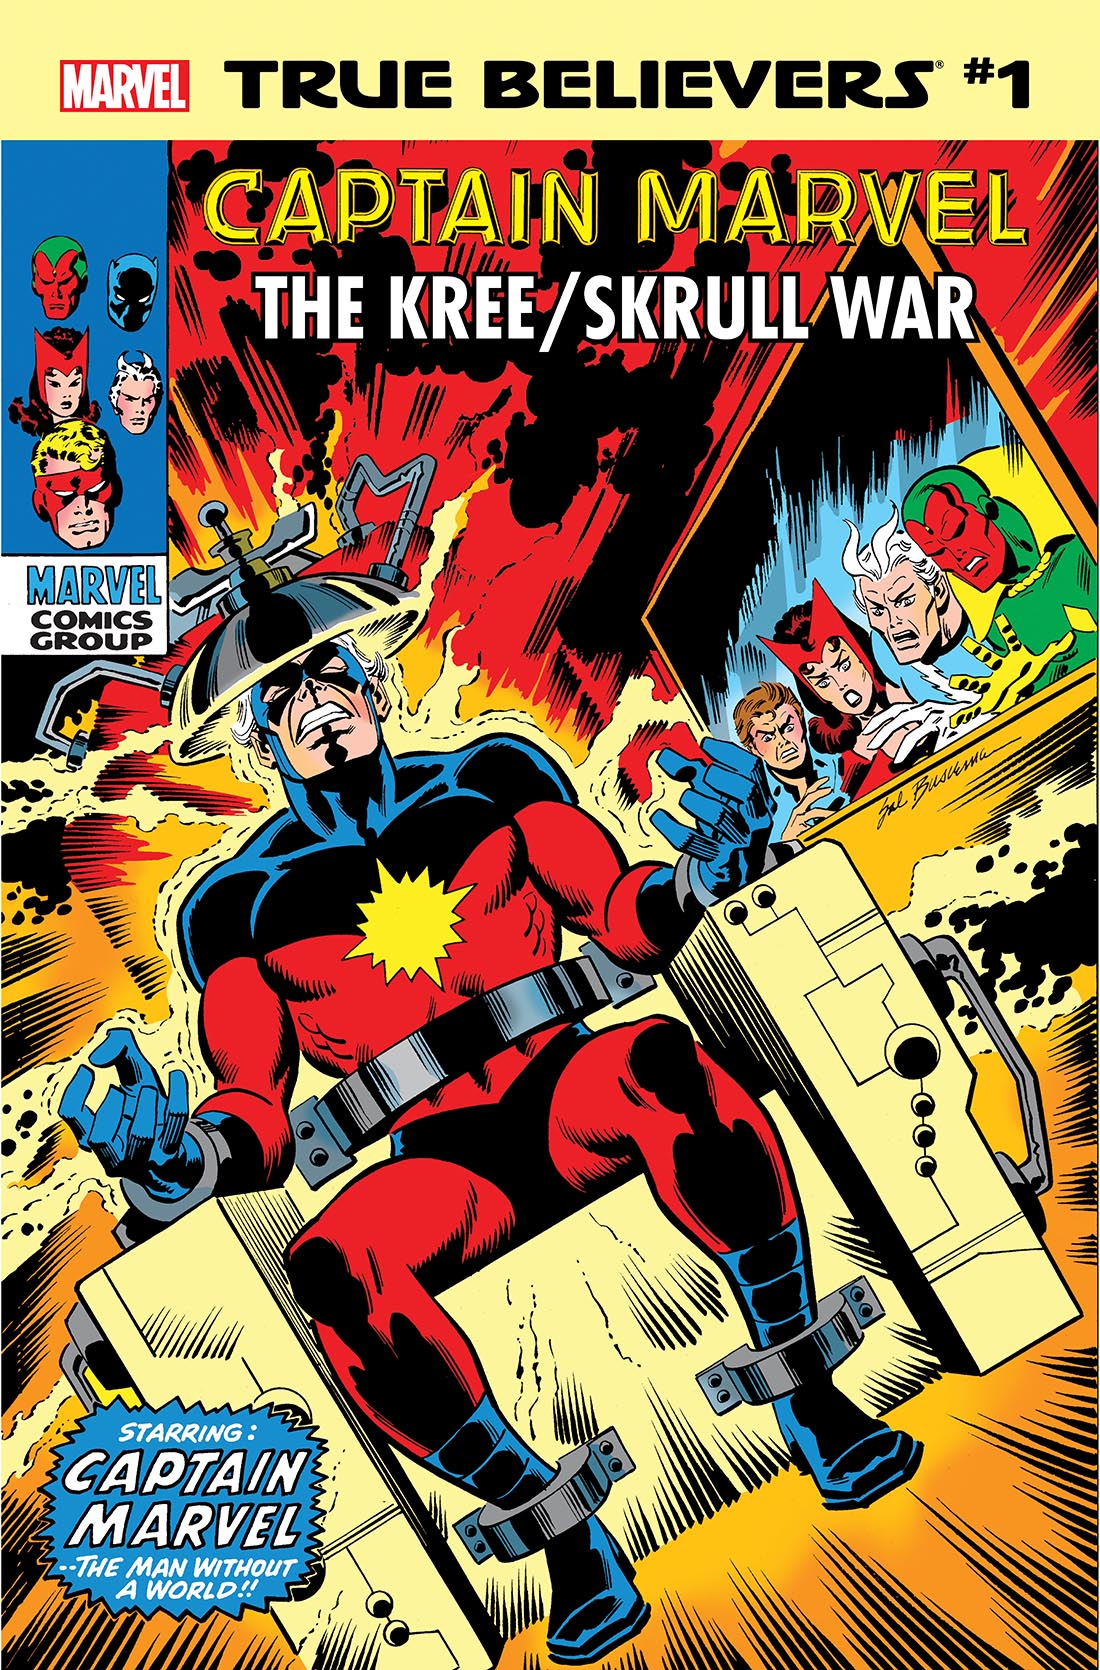 True Believers: Captain Marvel - The Kree/Skrull War Vol 1 1